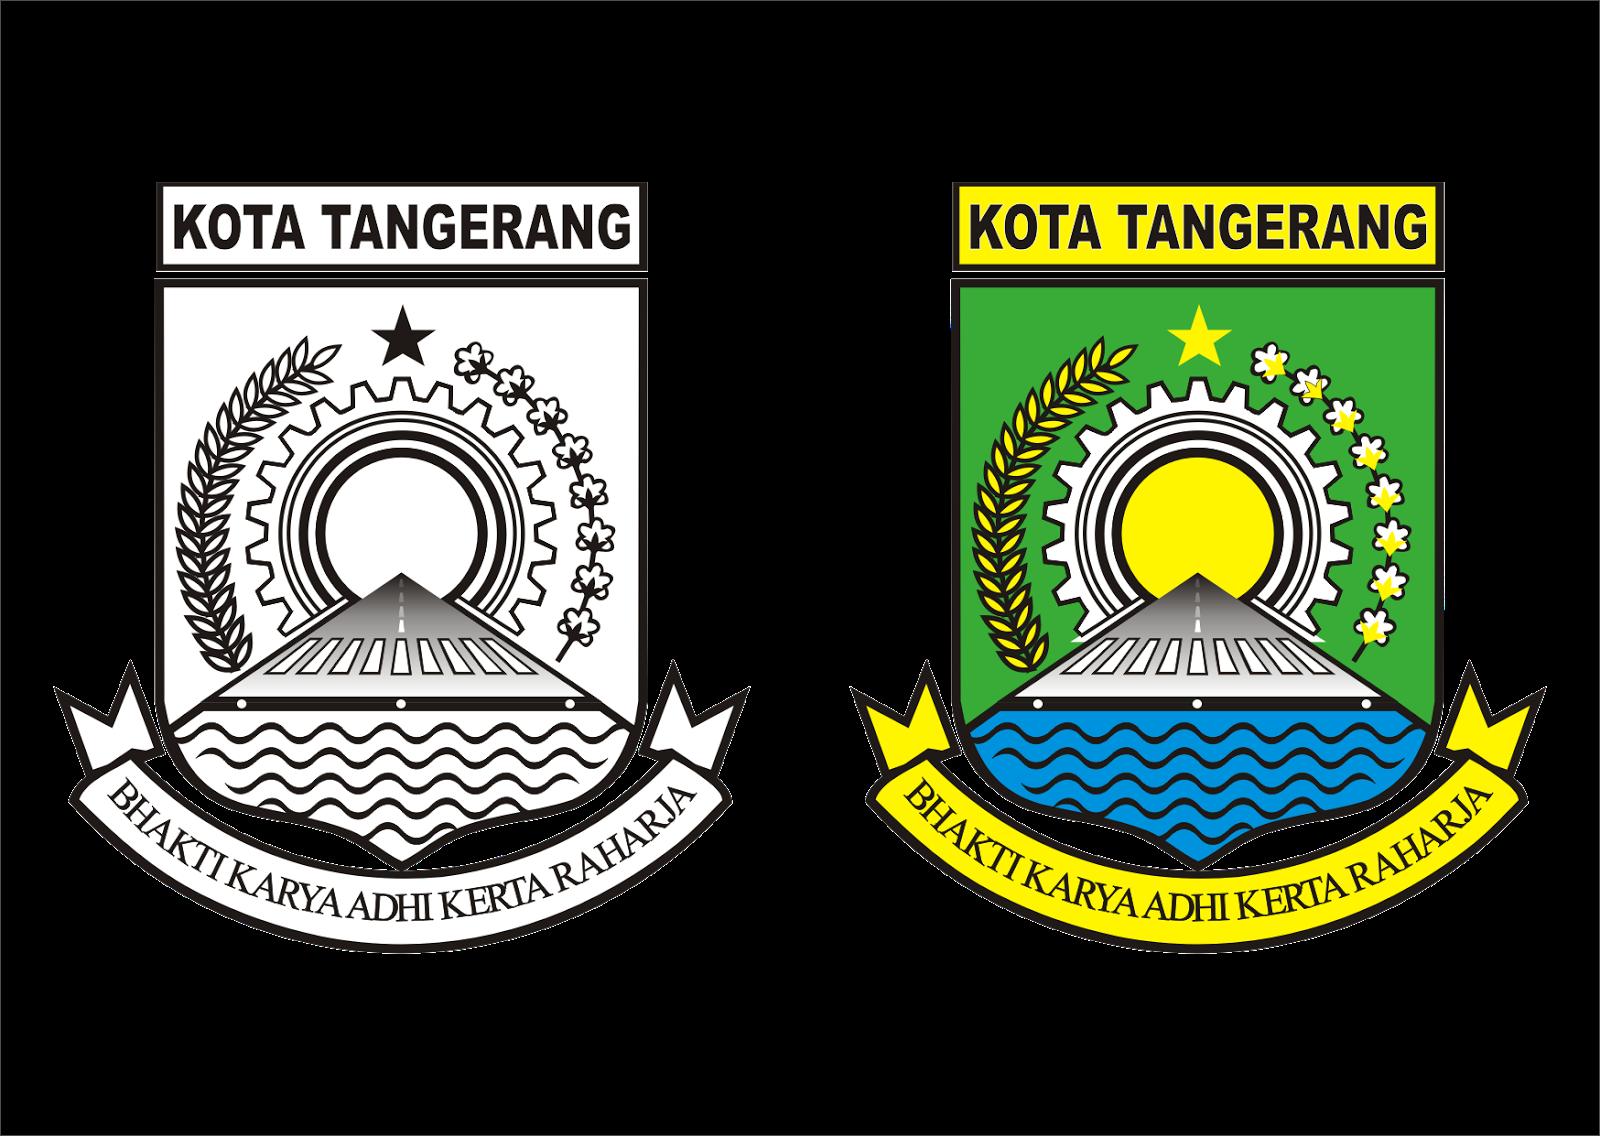 Logo Kota Tangerang Vector Desain Logo Kota Tangerang Desain